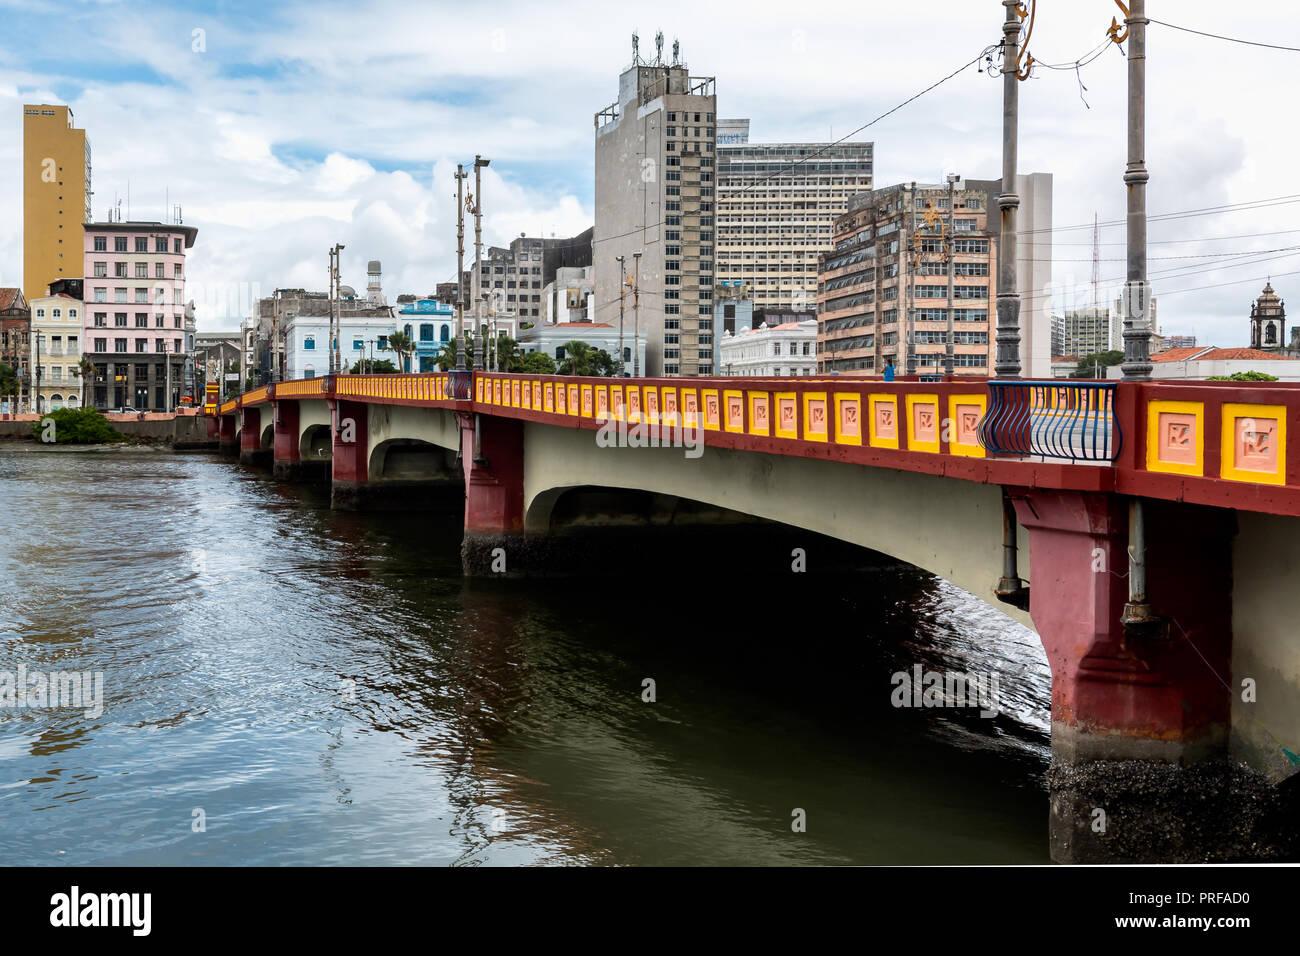 Capibaribe River (Rio Capibaribe), Alfandega Bund (Cais da Alfândega), Recife, Pernambuco, Brazil - Stock Image